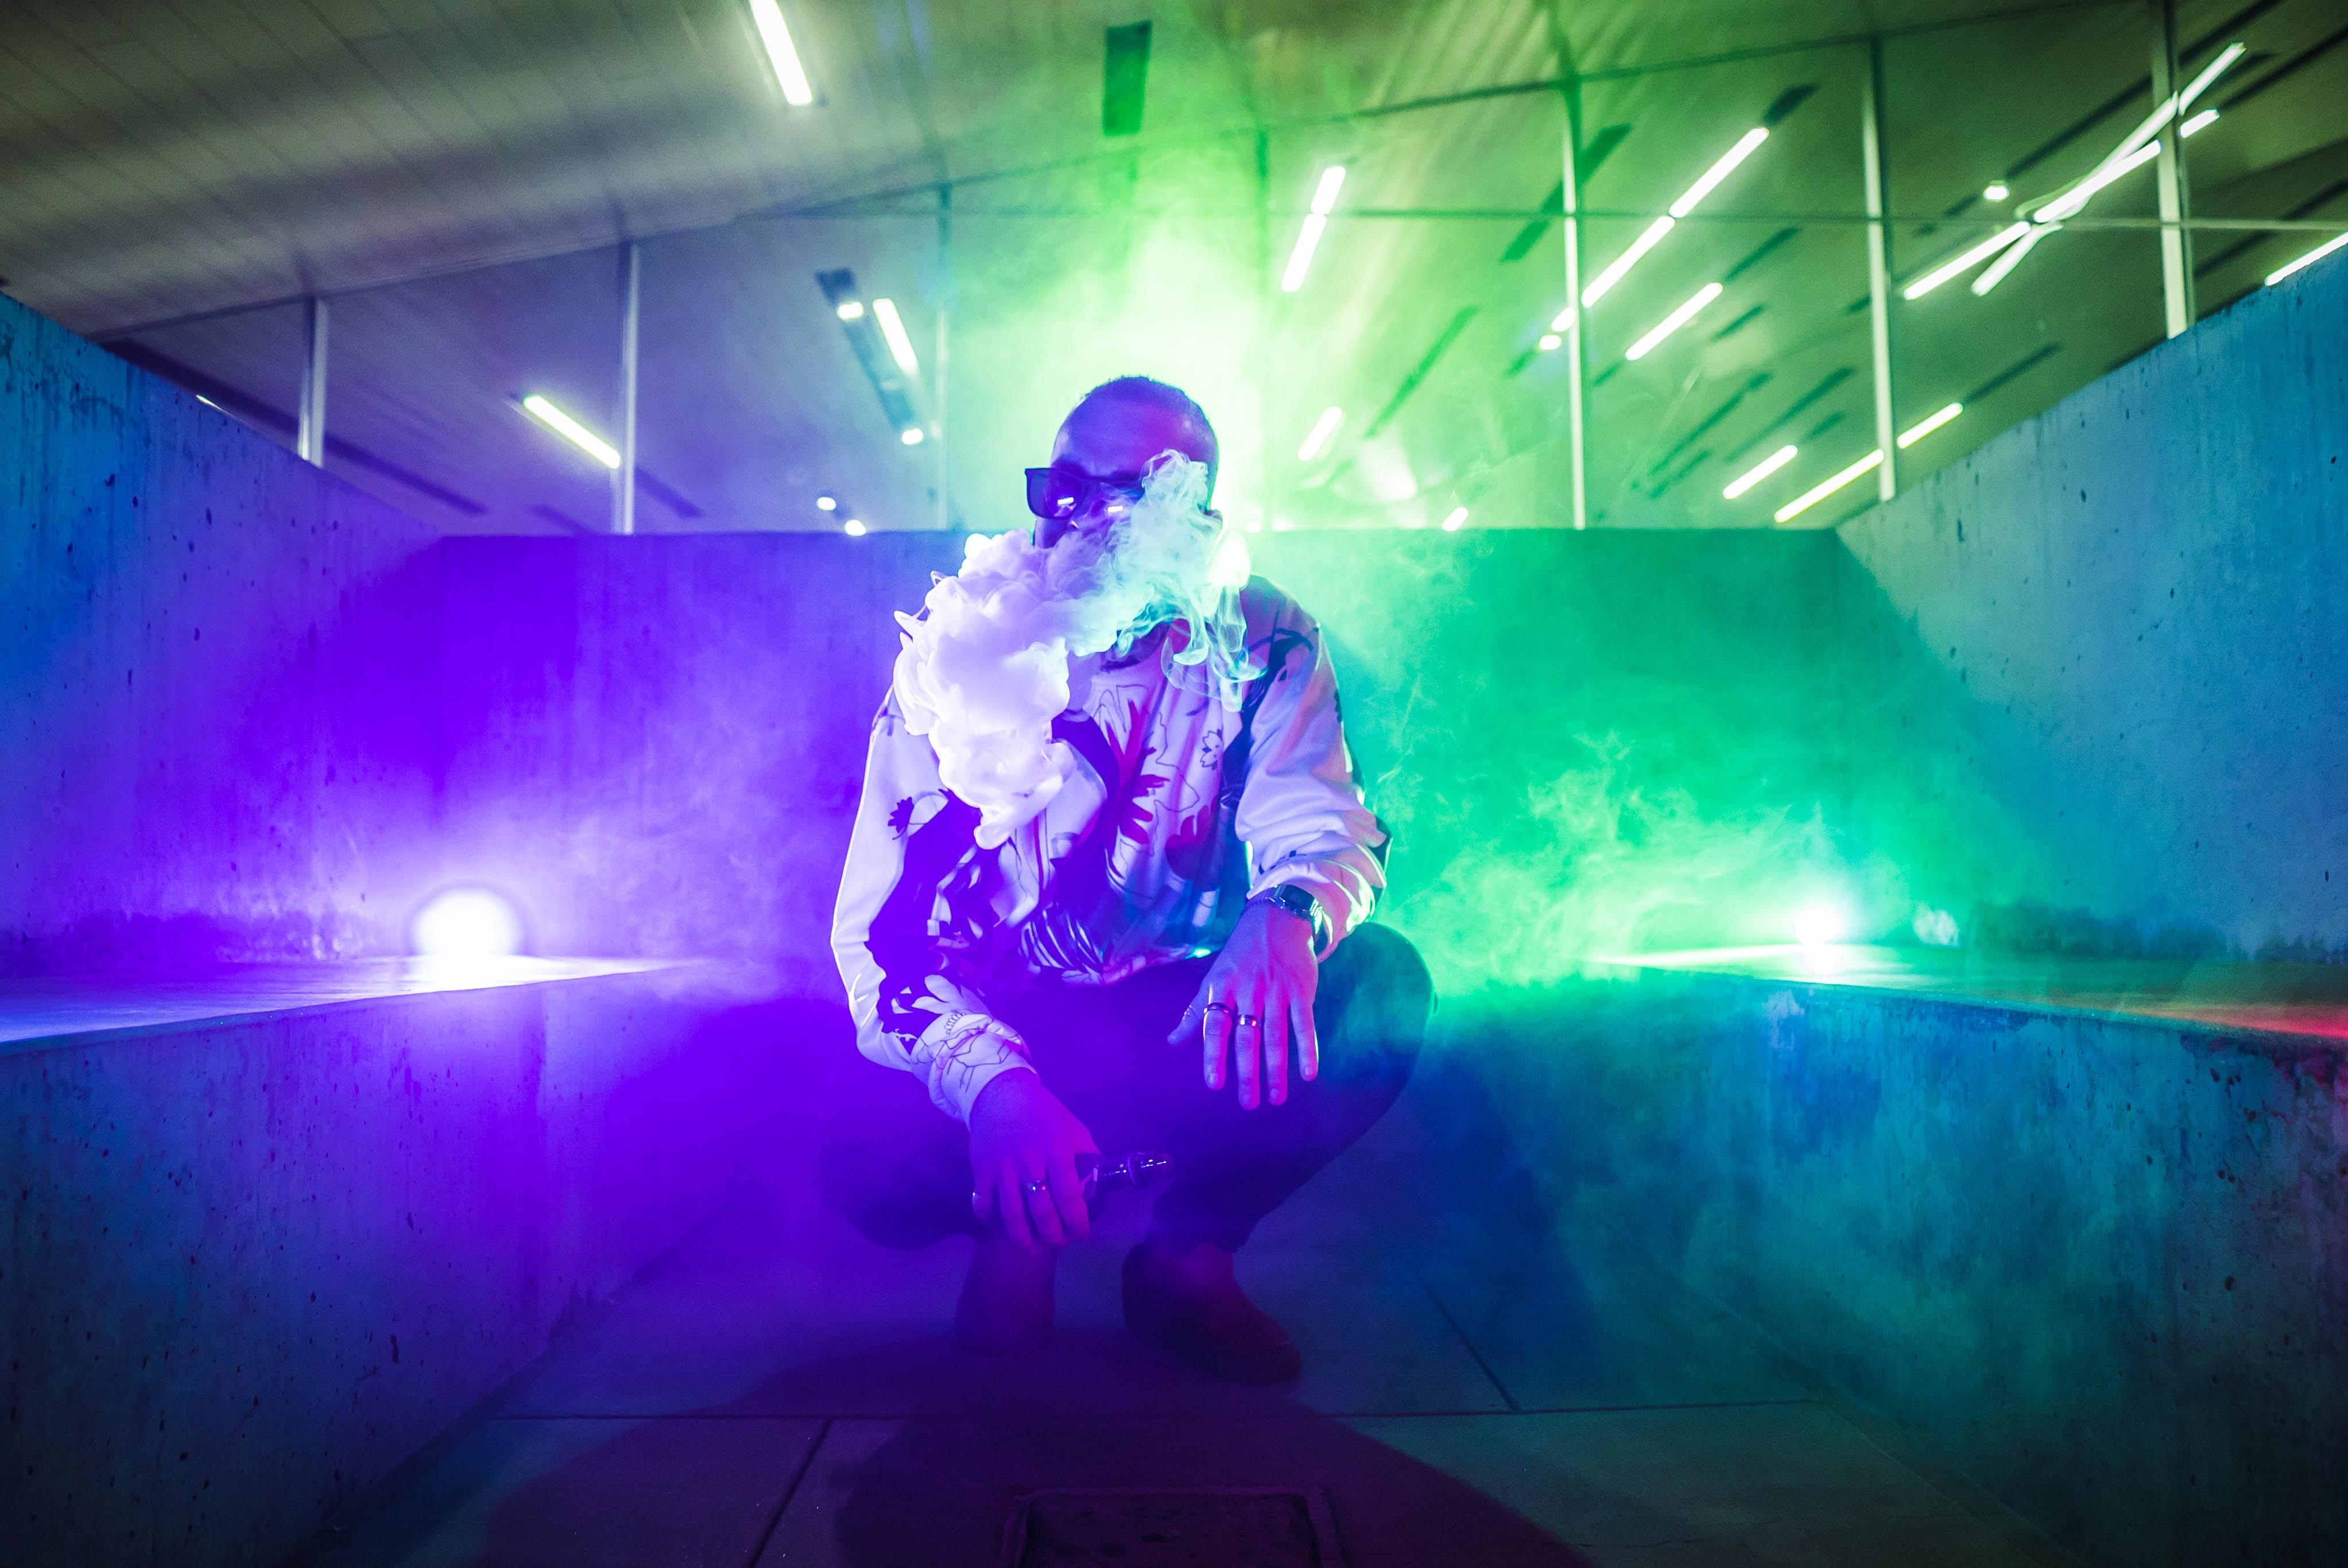 man with vape smoke squatting on ground